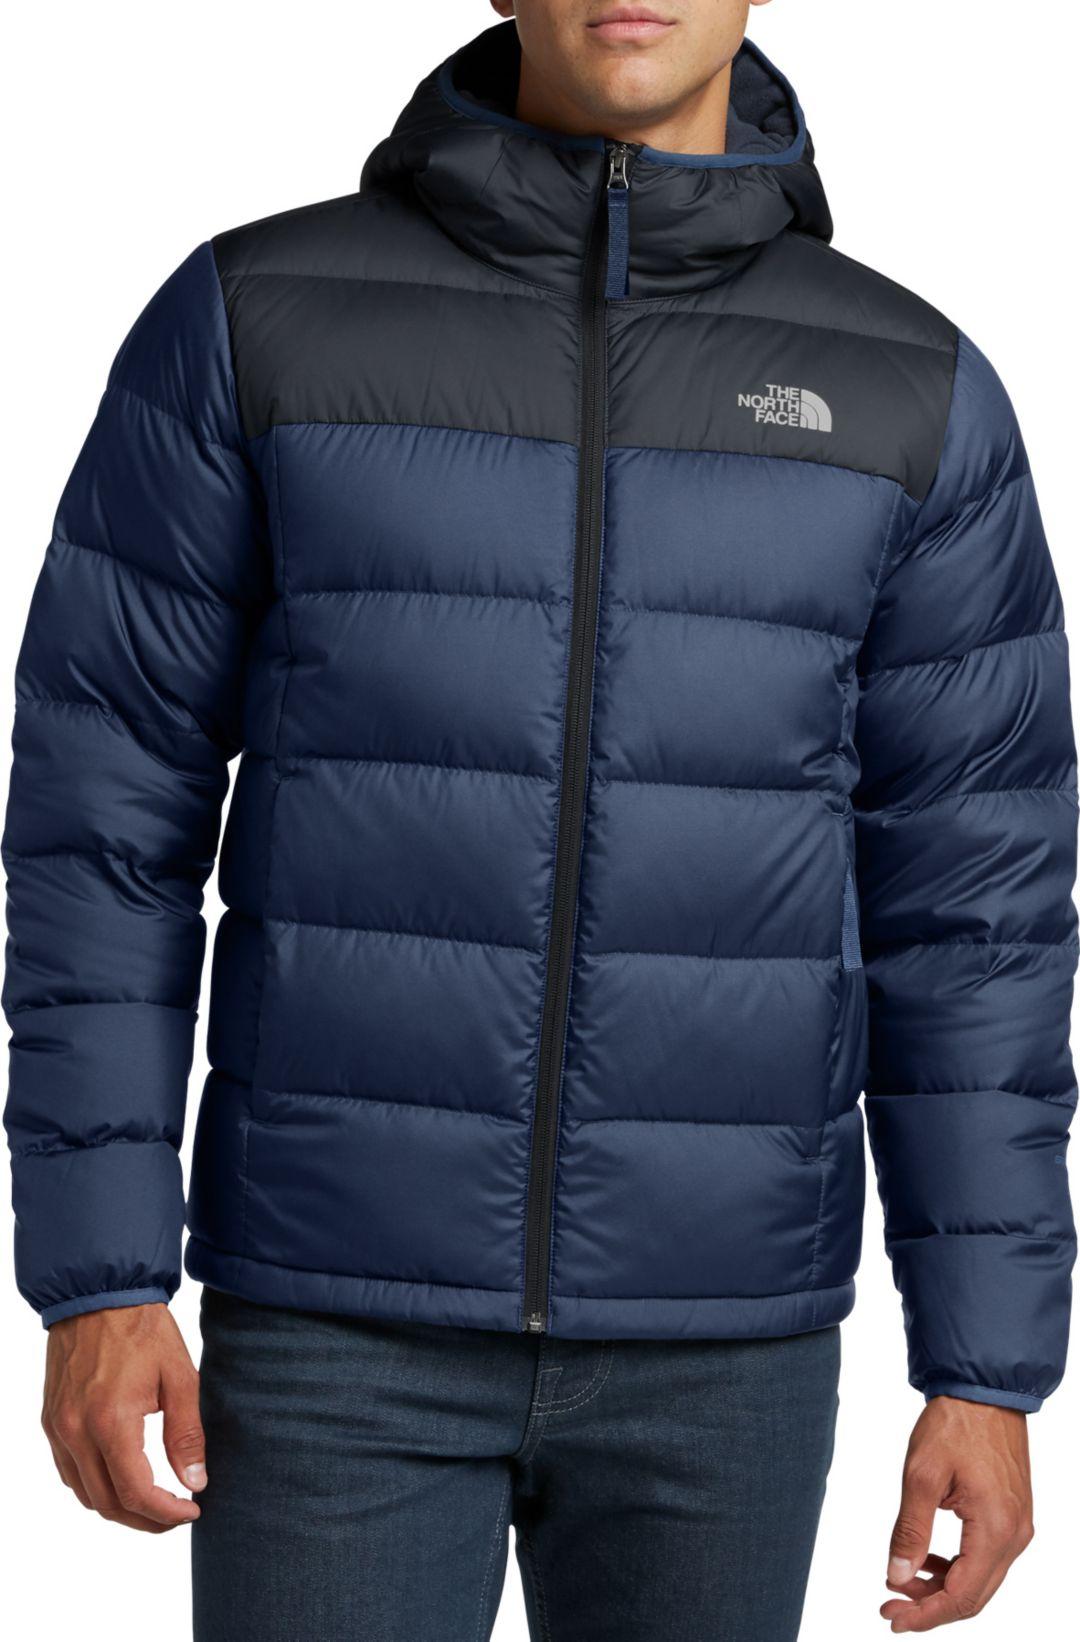 The North Face Nuptse 2 Down Jacket (Men's)   Peter Glenn